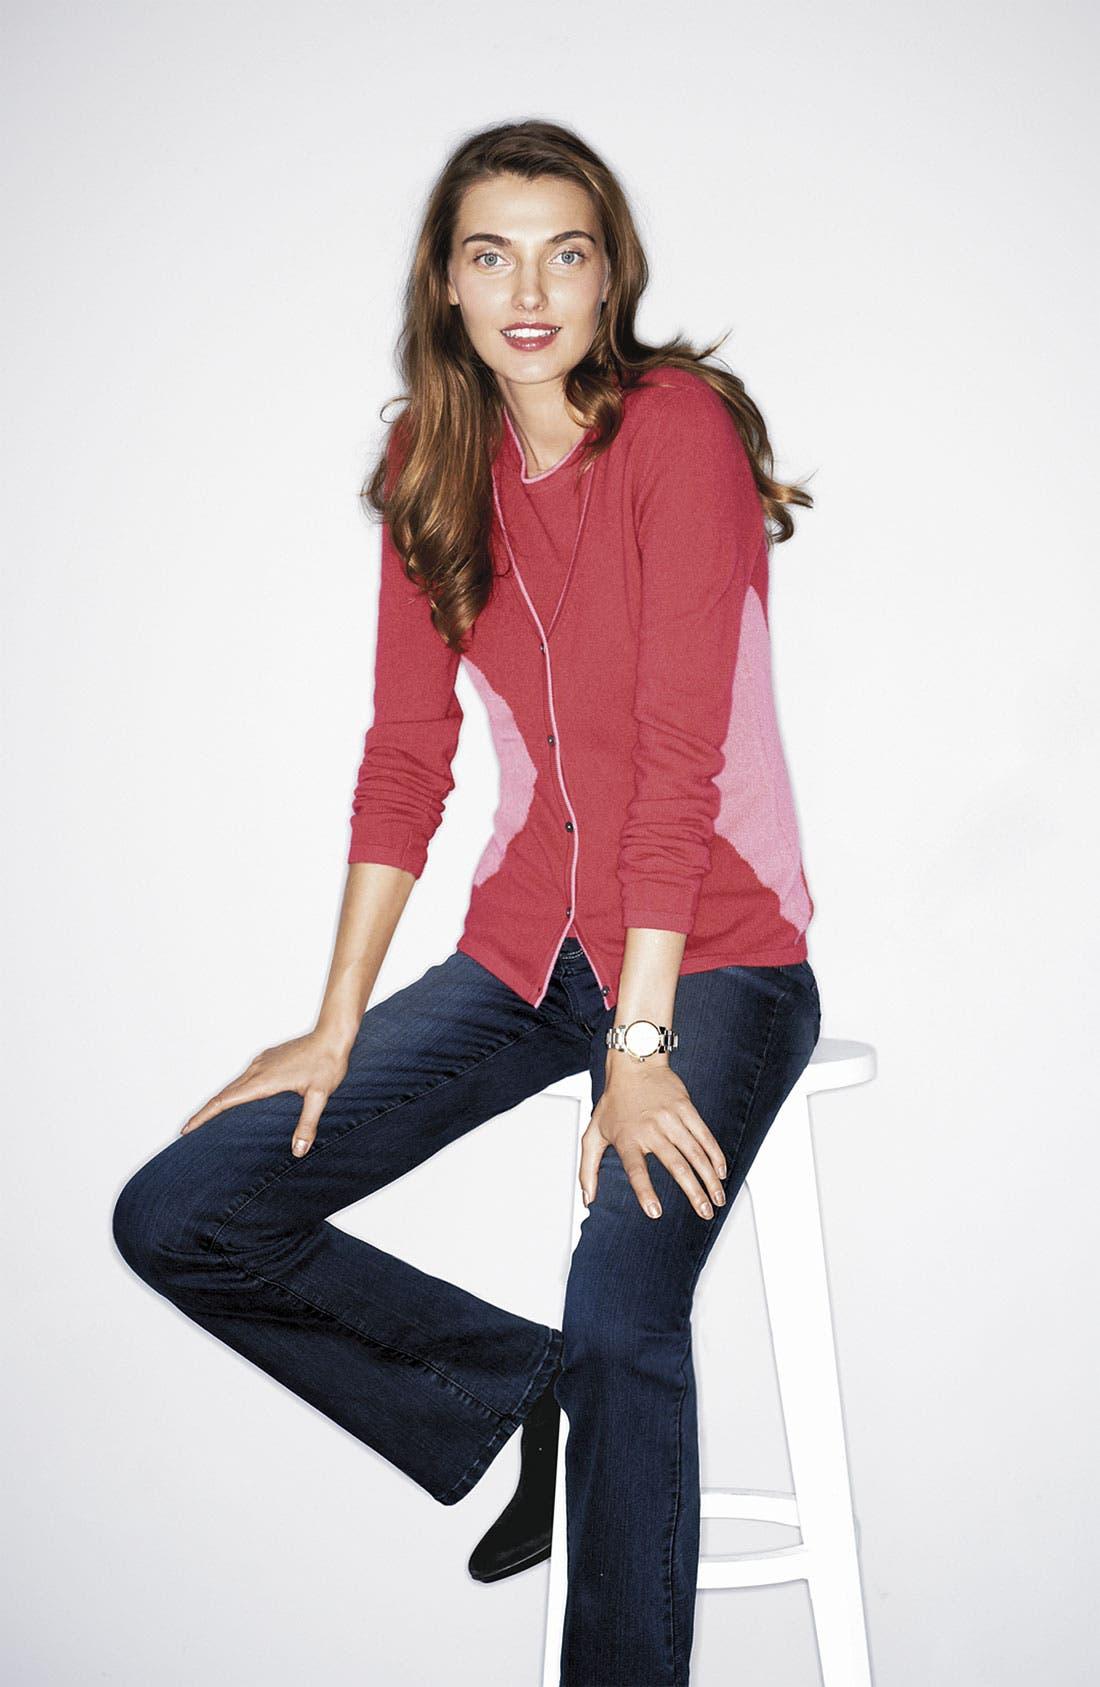 Main Image - Lauren Hansen Cardigan & Shell, NYDJ Jeans